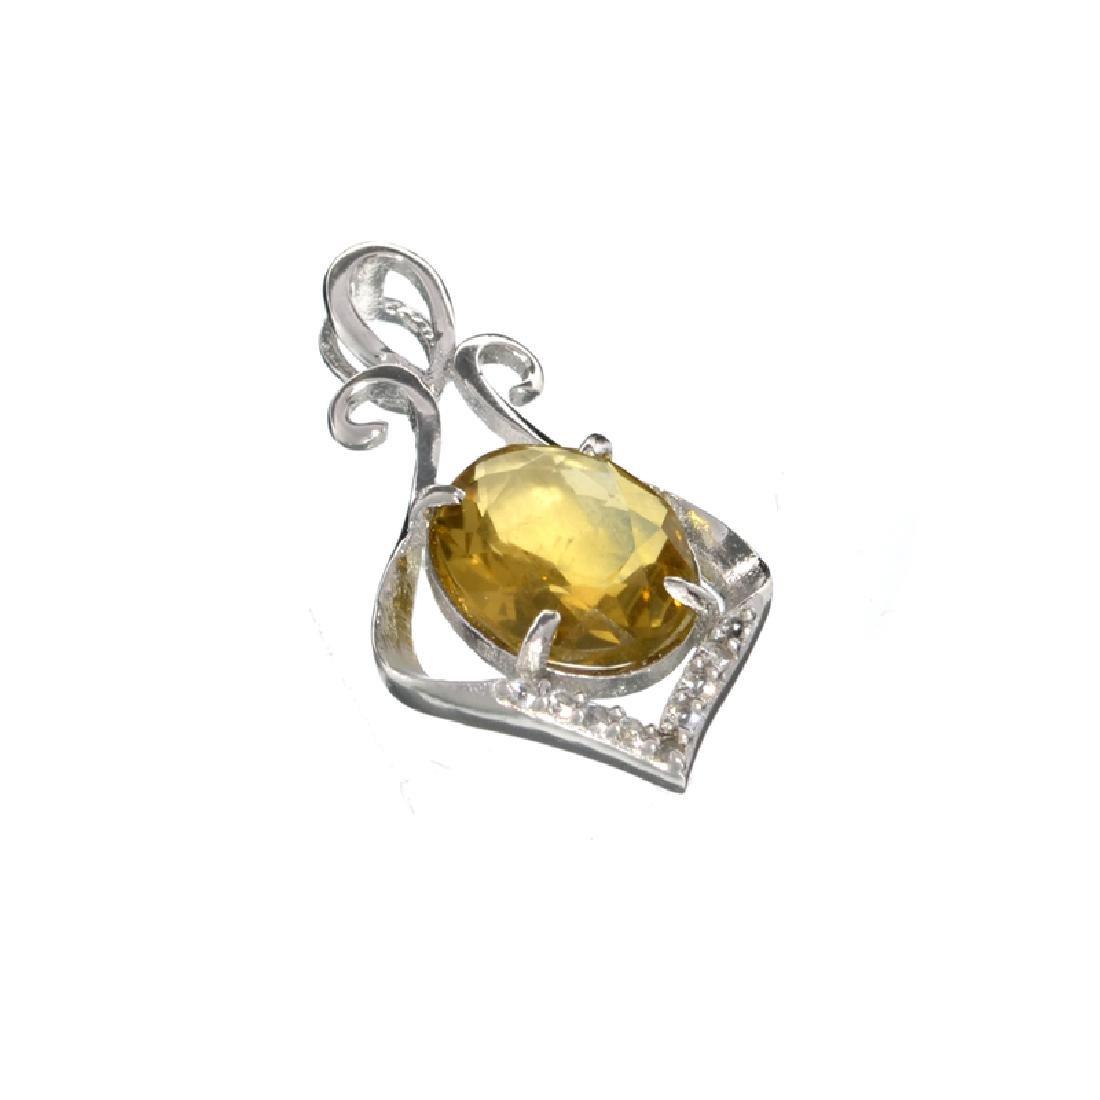 APP: 0.4k Fine Jewelry 2.00CT Oval Cut Citrine/White